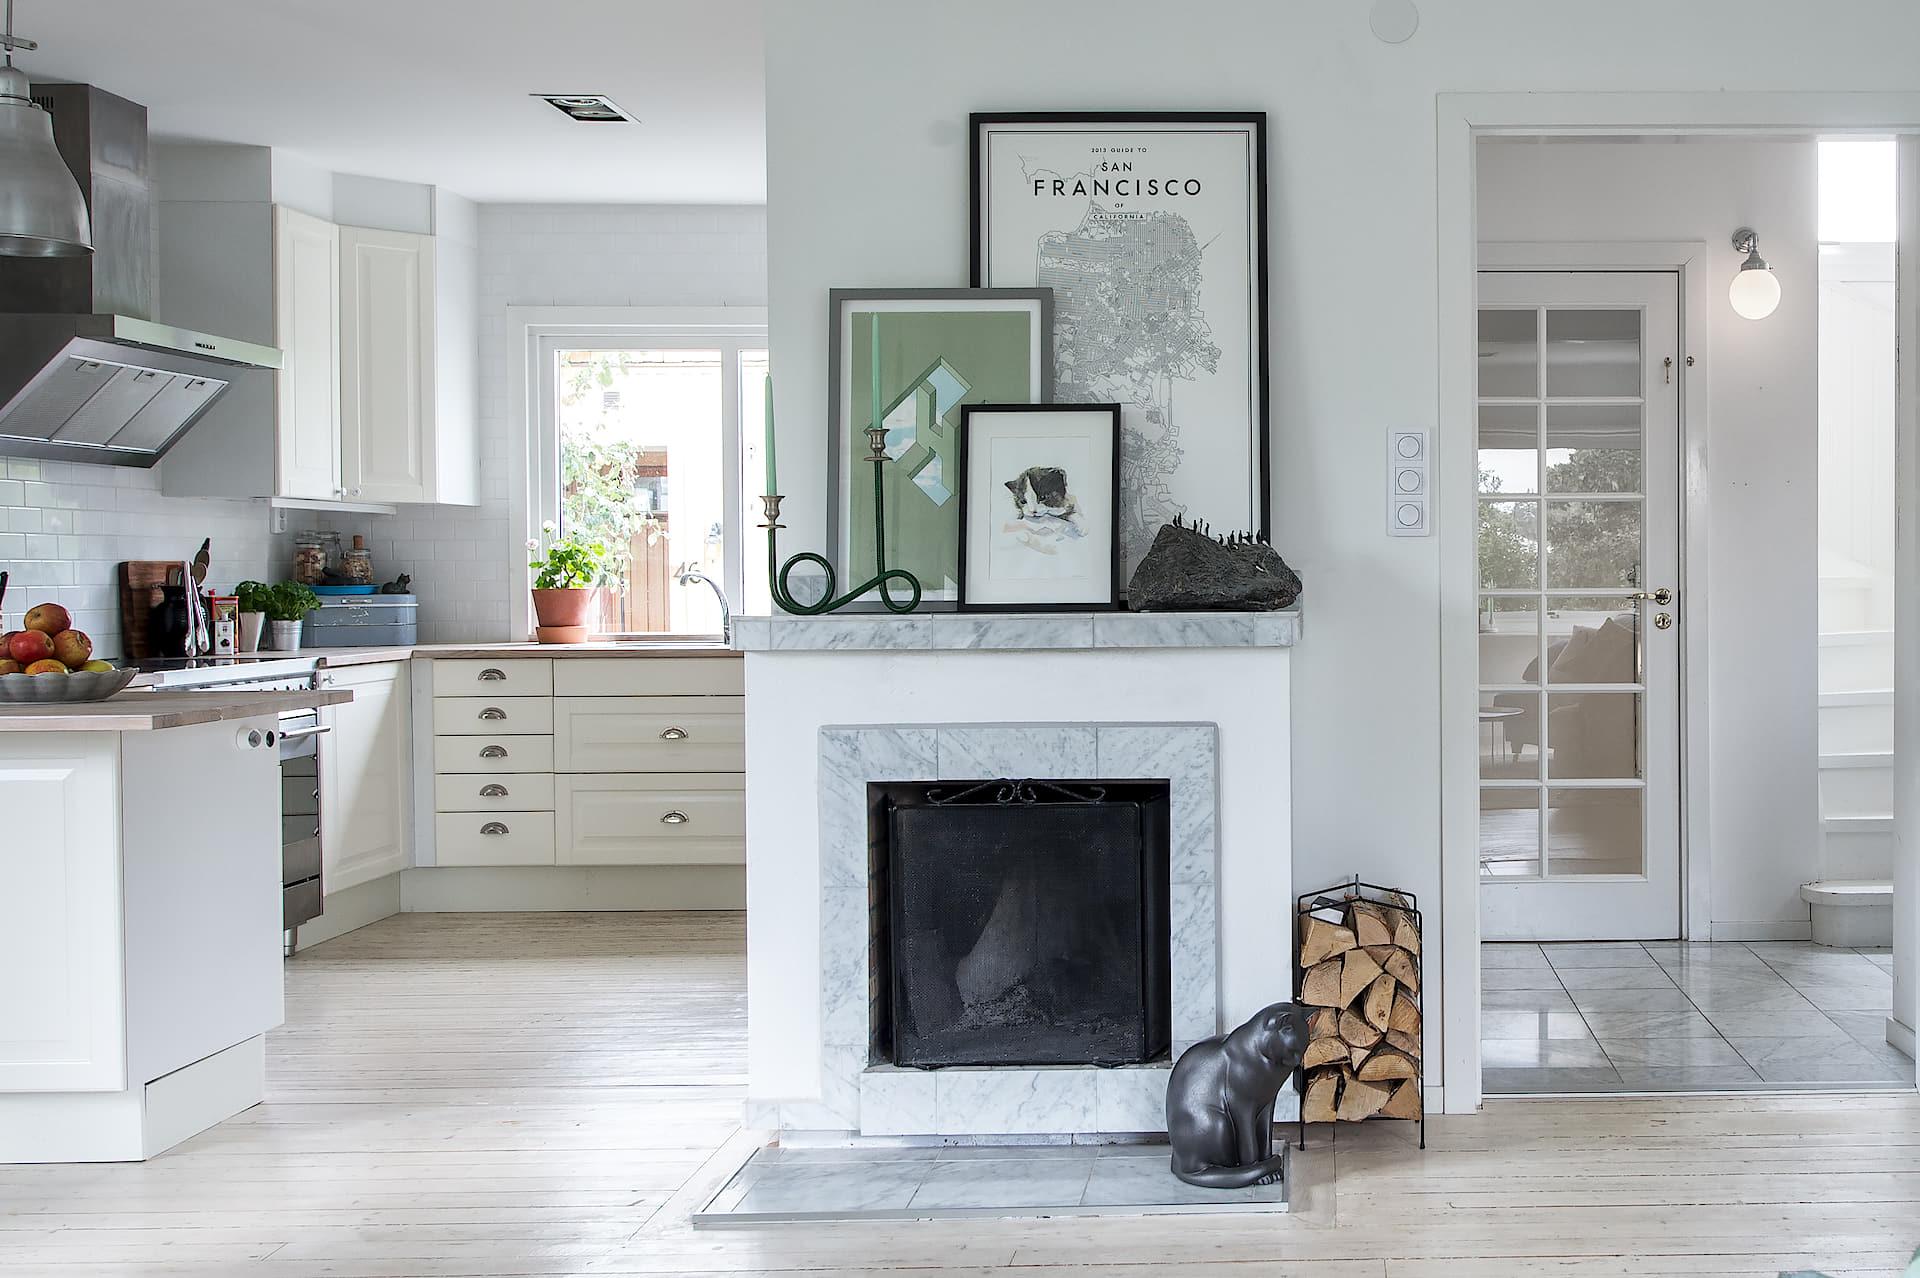 камин деревянный пол кухня белые фасады